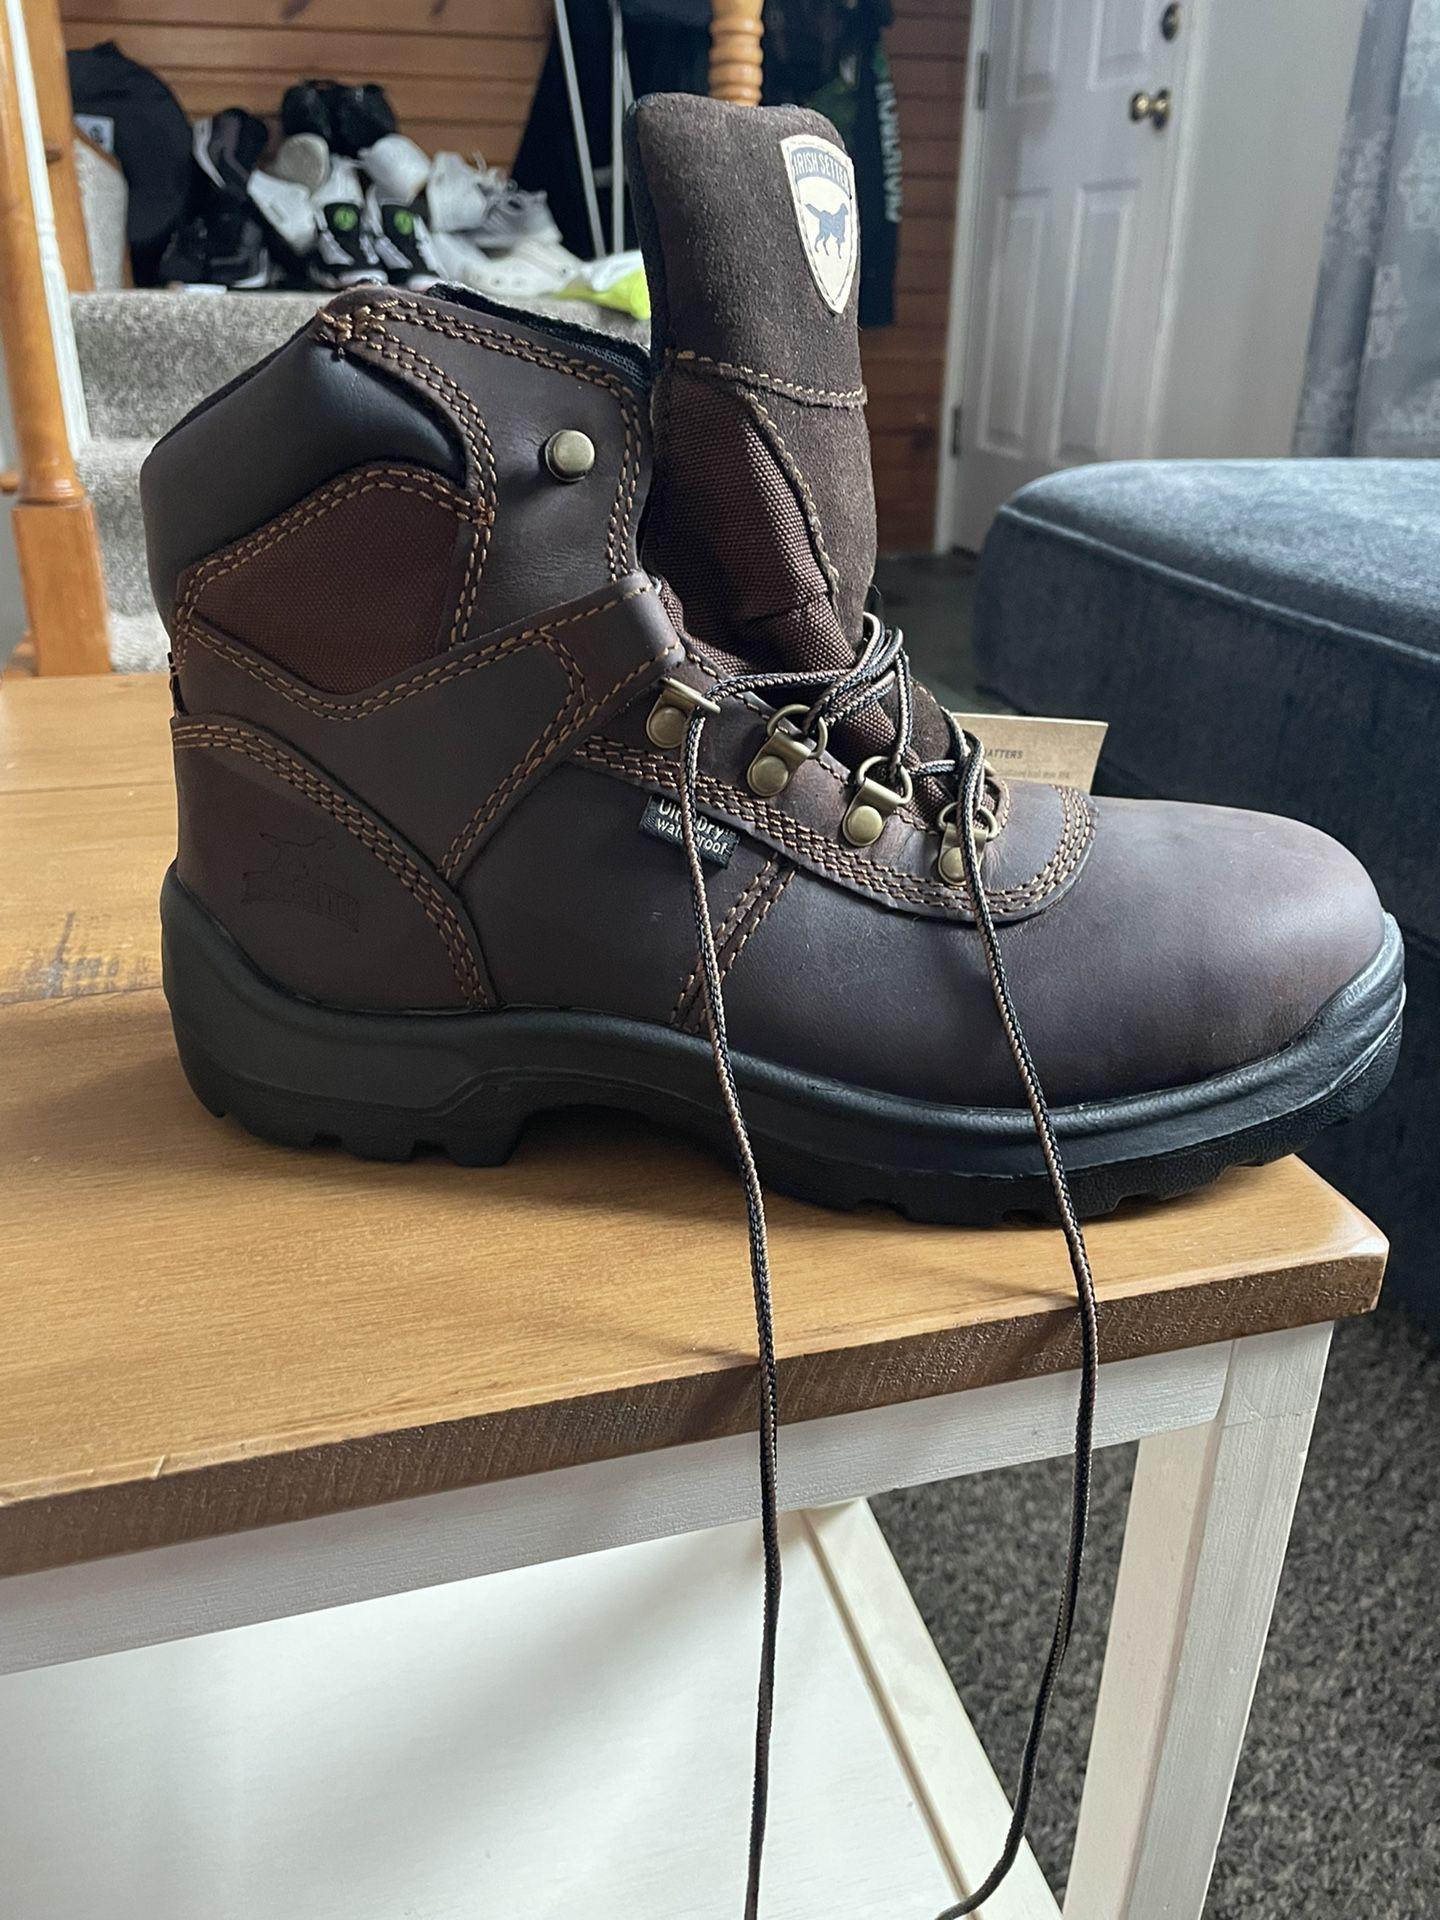 Size 8 Men's Irish Setter Work Boots